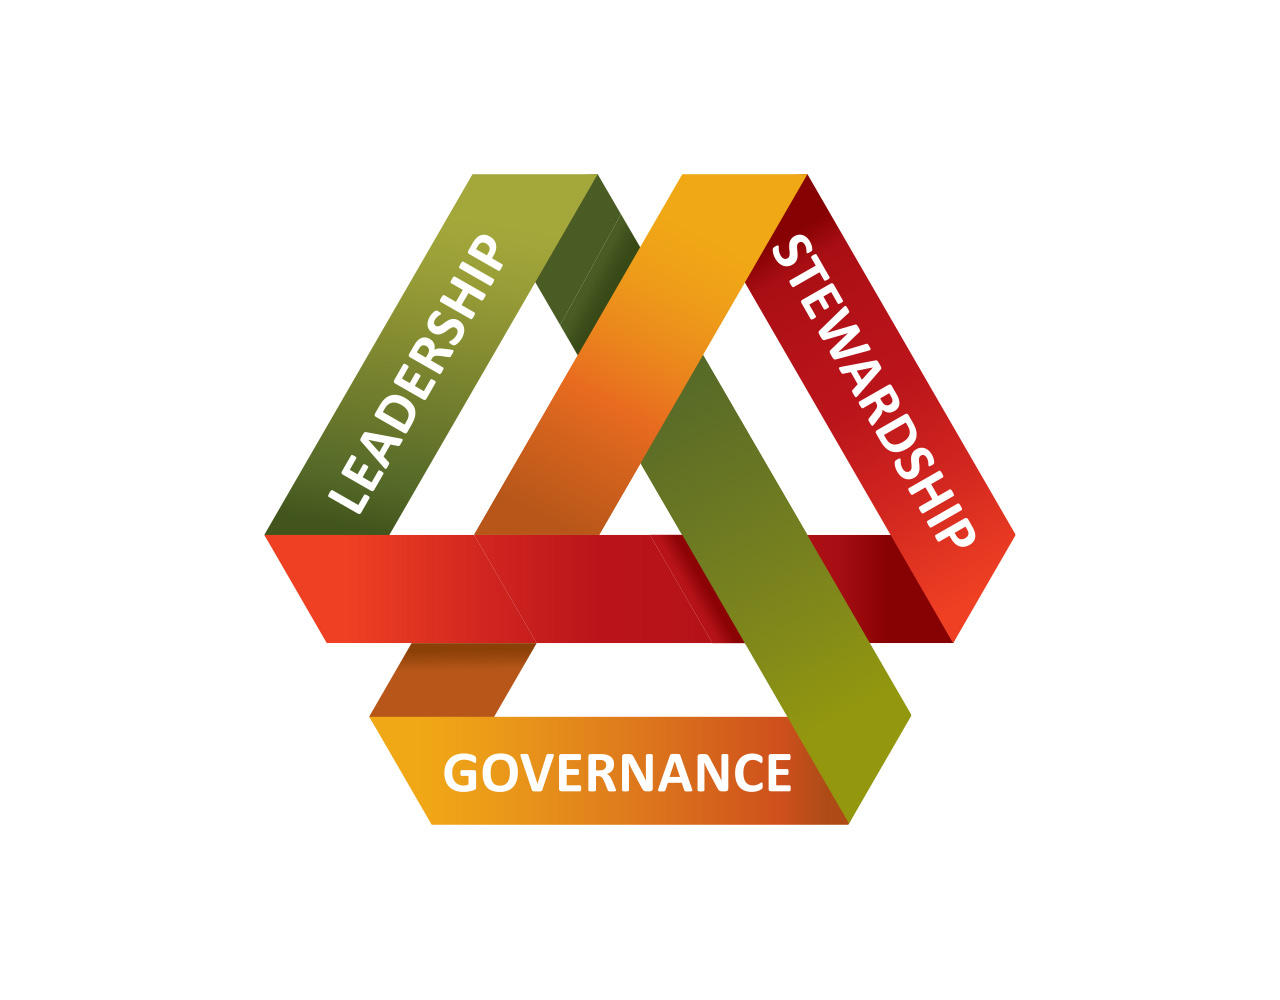 3ethos Leadership Governance Stewardship logo